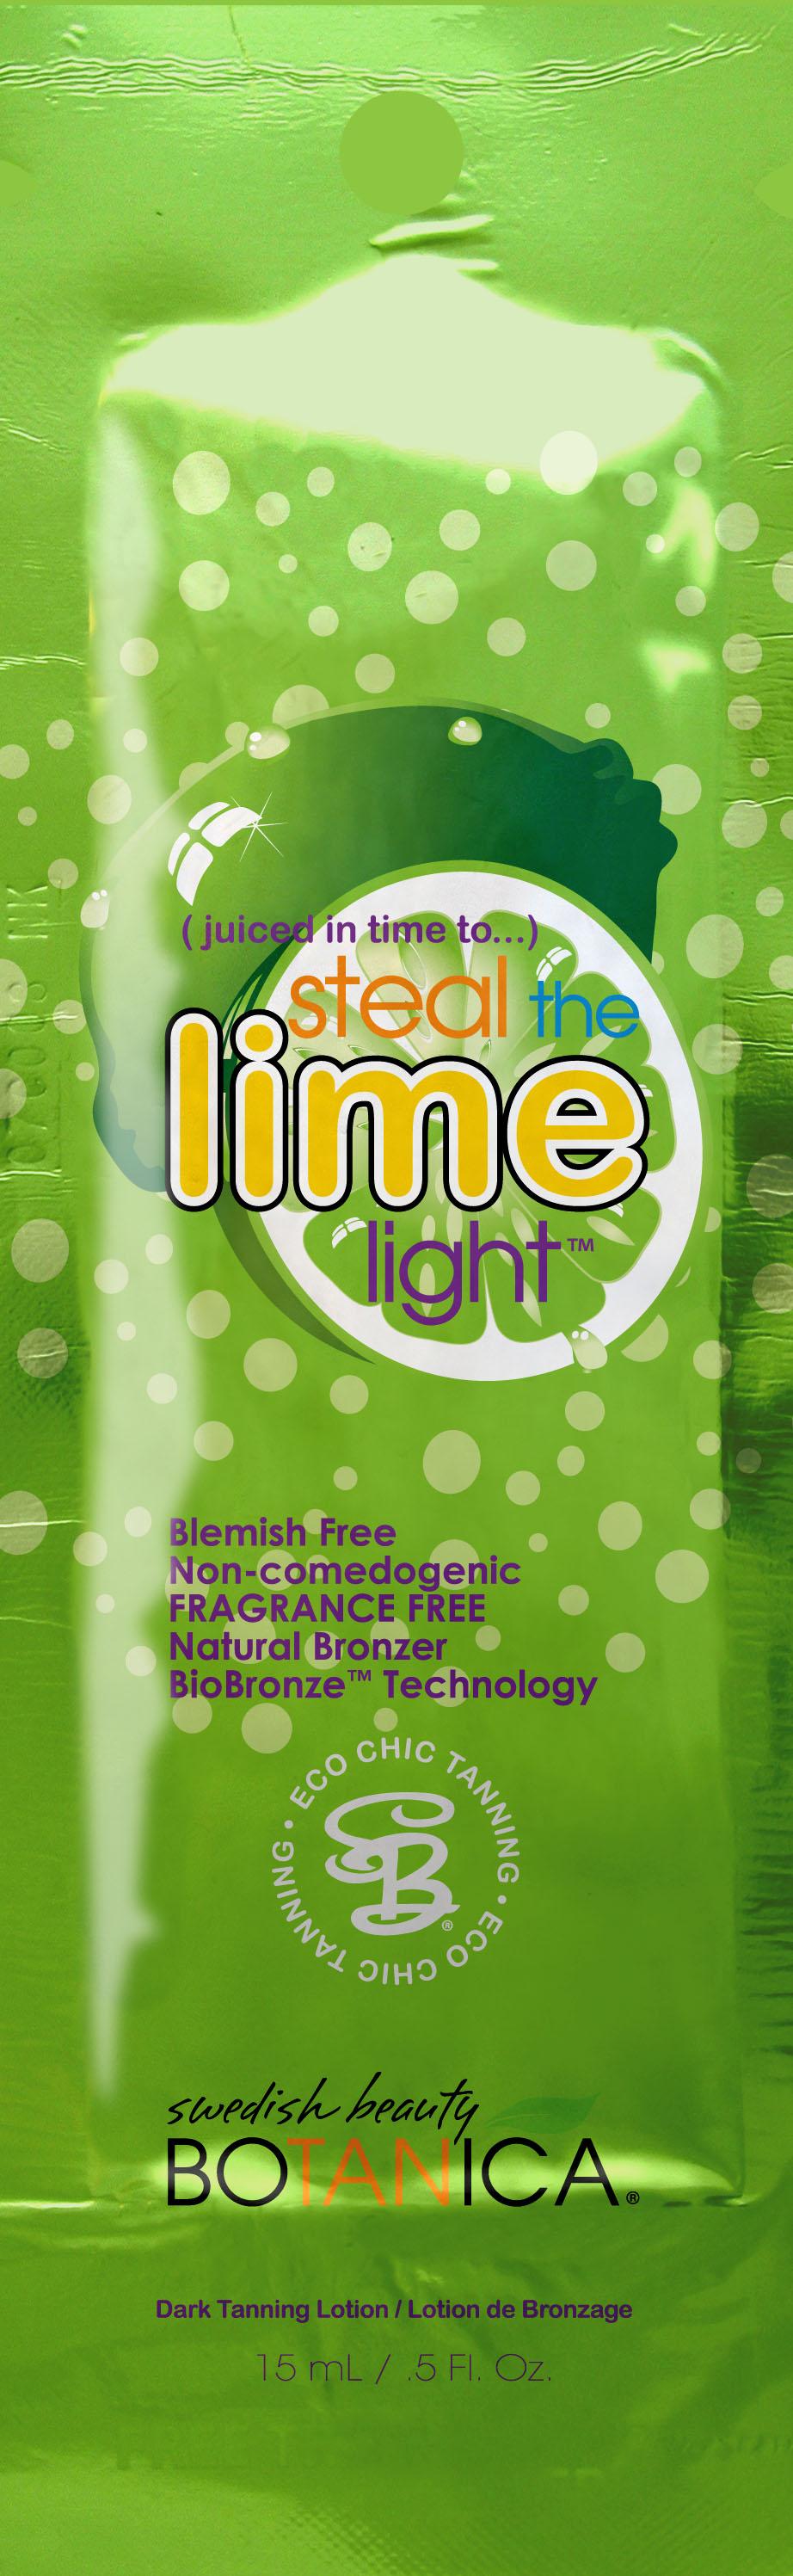 Steal The Limelight™ Blemish Free Natural Bronzer Pkt